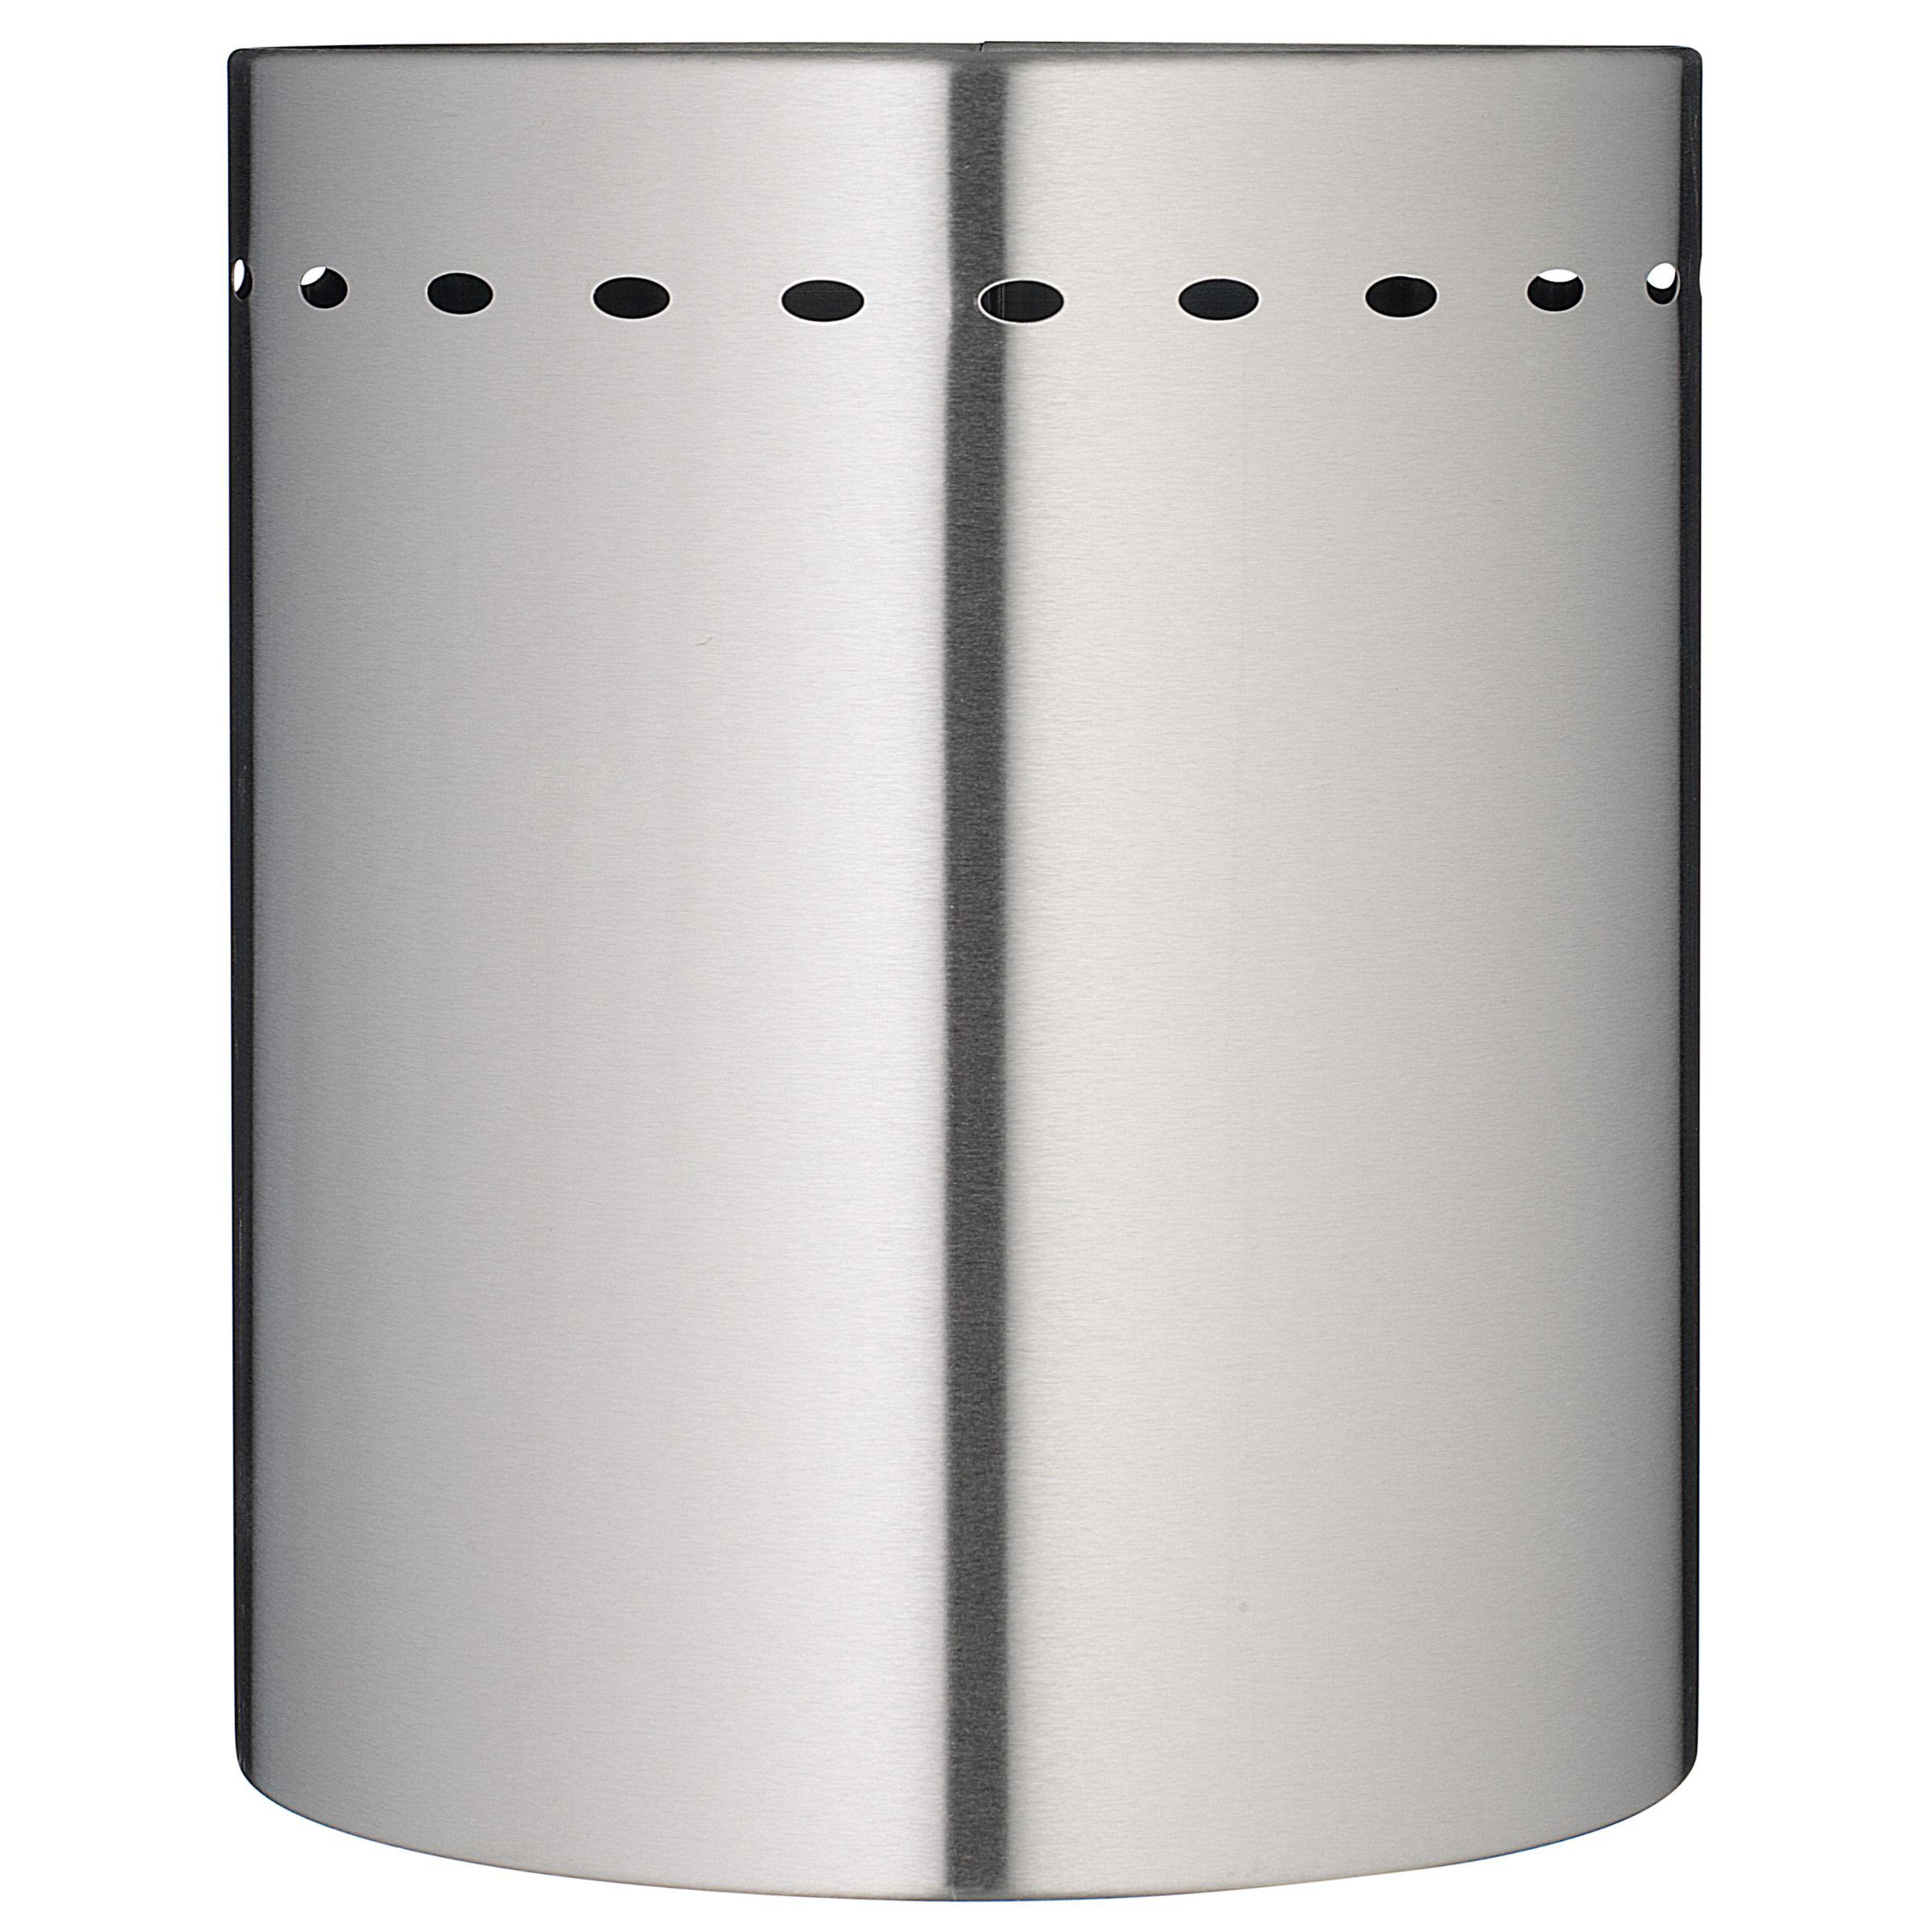 John Lewis Waste Paper Bin, Stainless Steel,